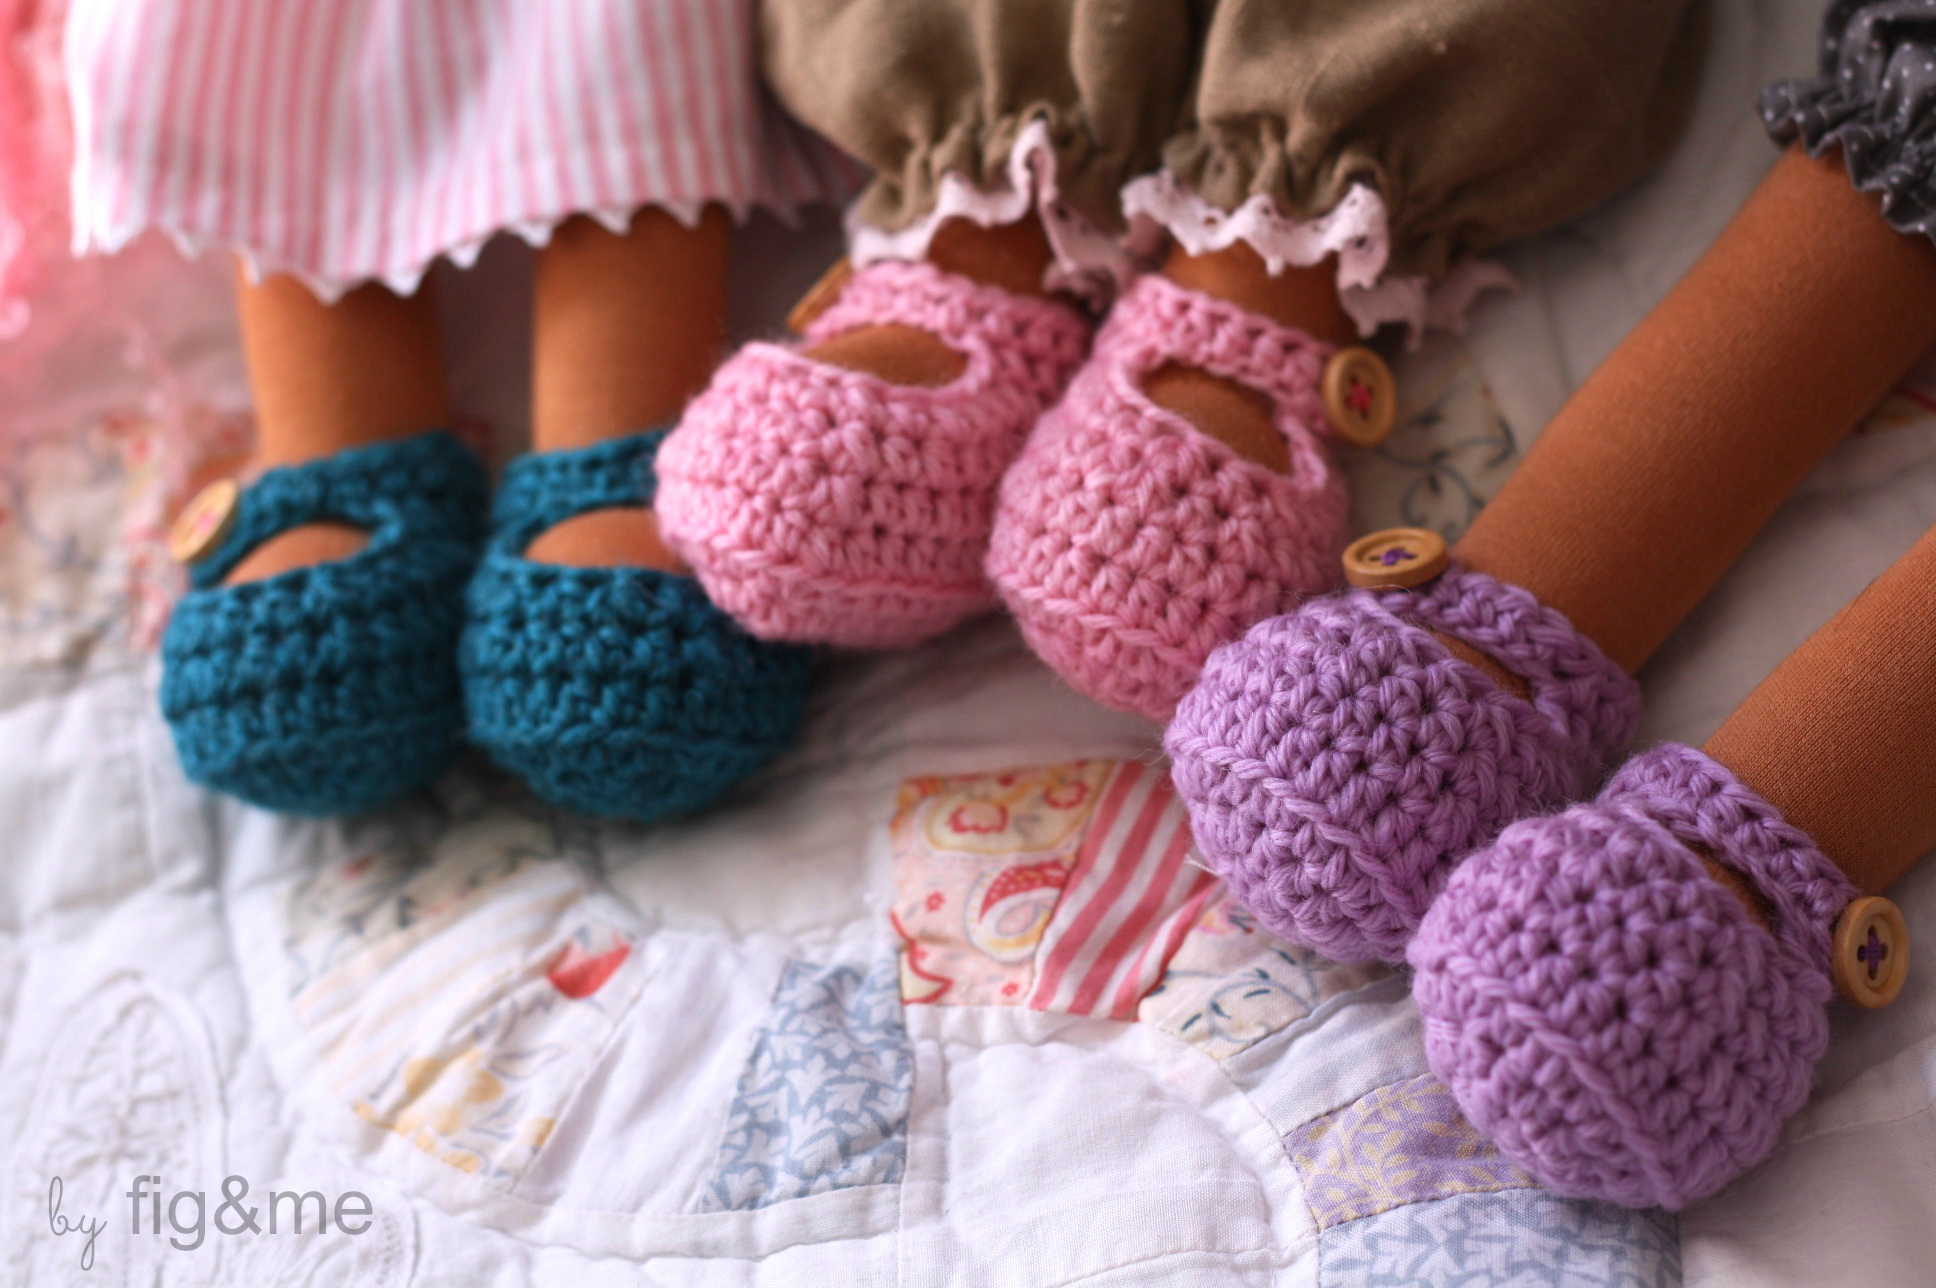 littleshoes-figandme.jpg